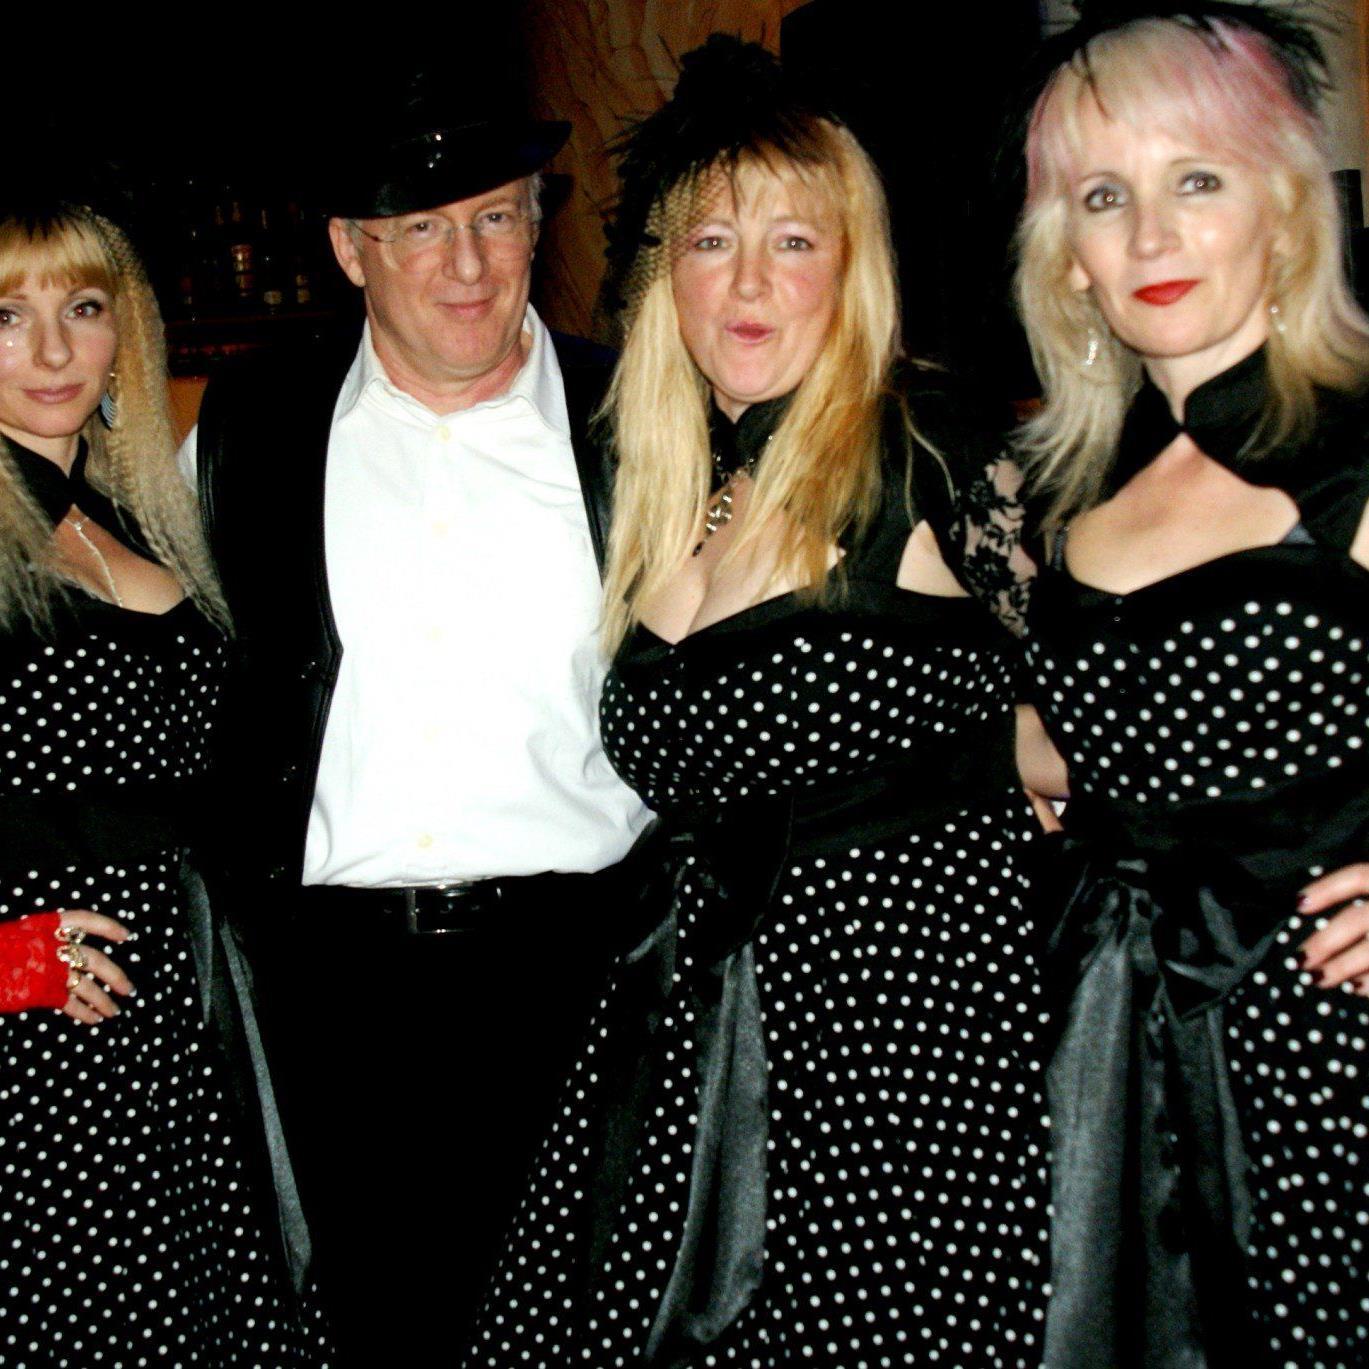 The Crazy Sisters mit Peter Cavall - Ein swingendes Quartett!